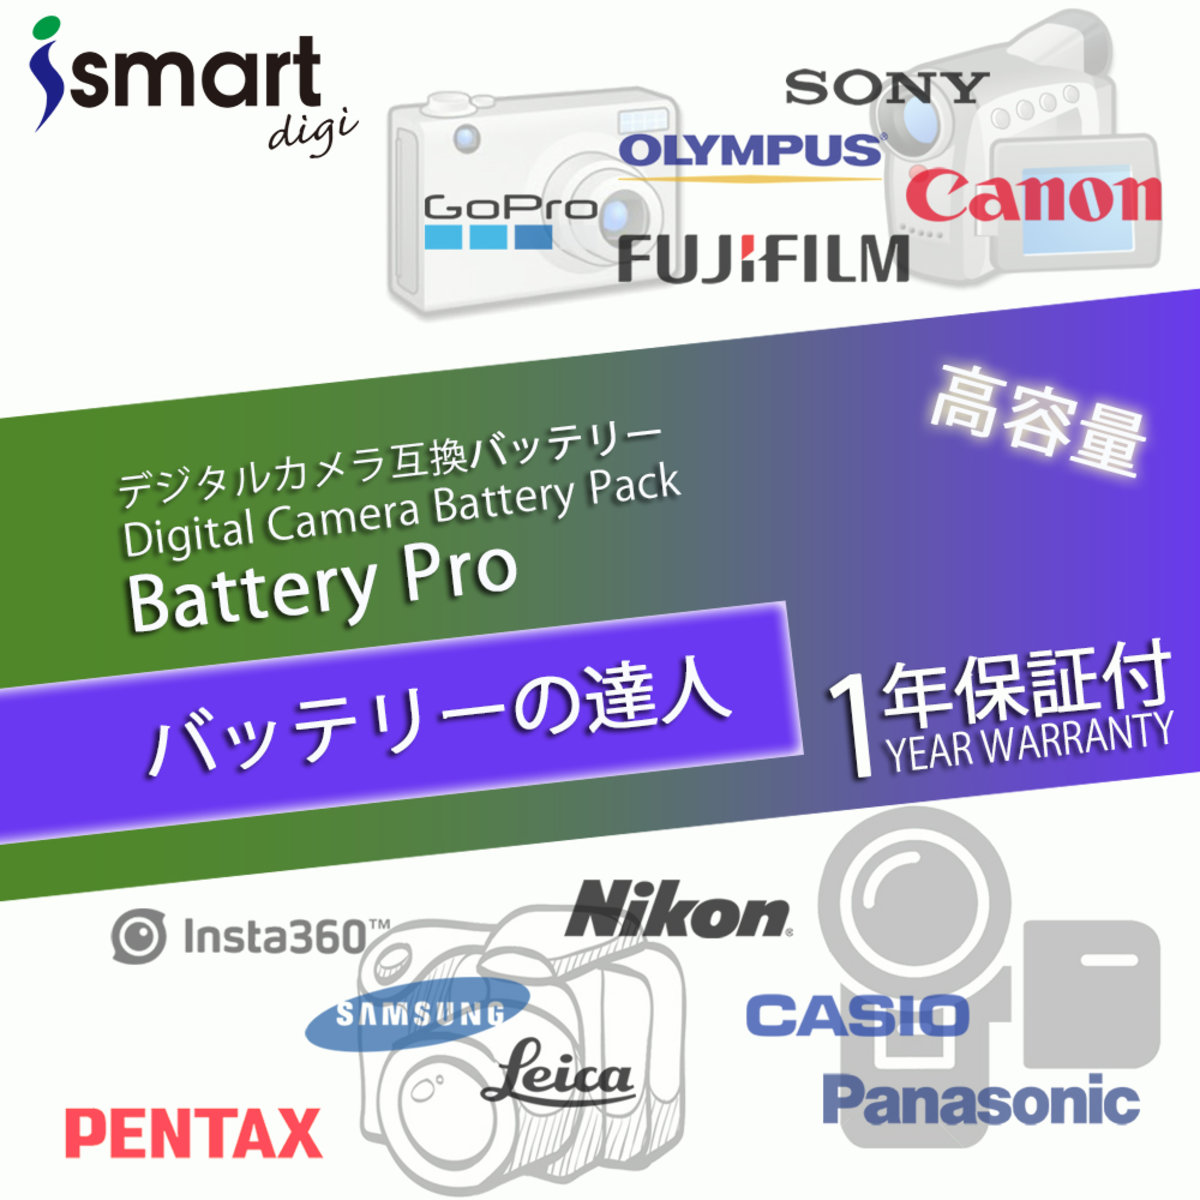 Panasonic Digital Camera Battery (For:DMC-FX8 Series,DMC-FX8, DMC-FX8-A, DMC-FX8-K, DMC-FX8-P, DMC-FX8-S, DMC-FX8BS)